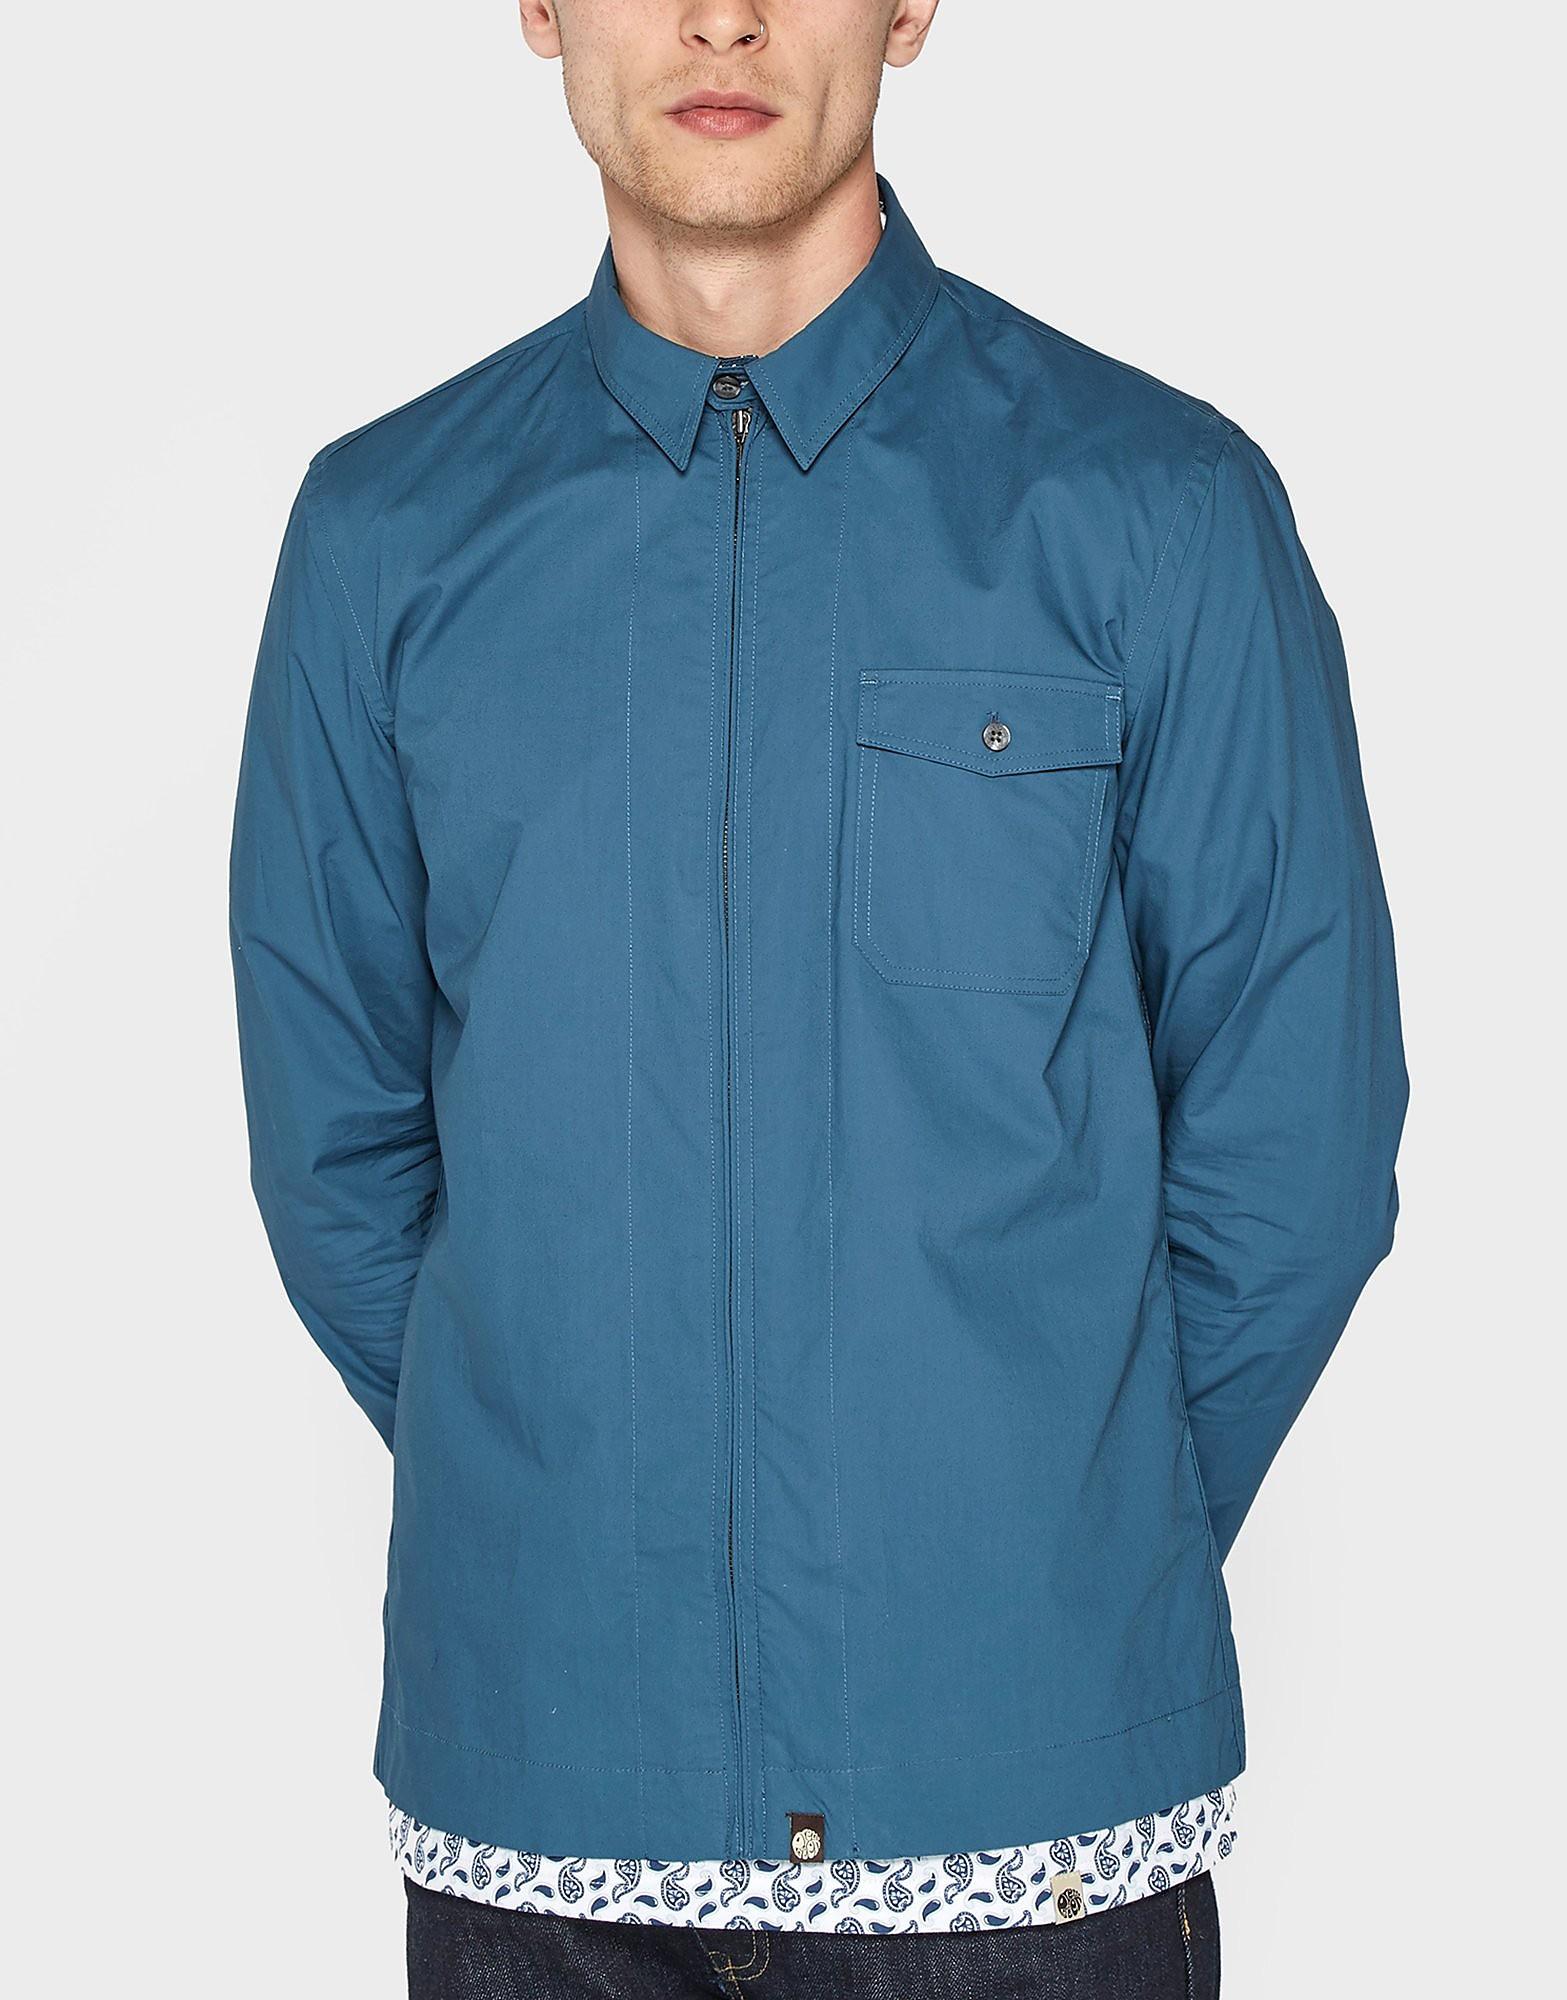 Pretty Green Zip Teal Long Sleeve Shirt - Exclusive